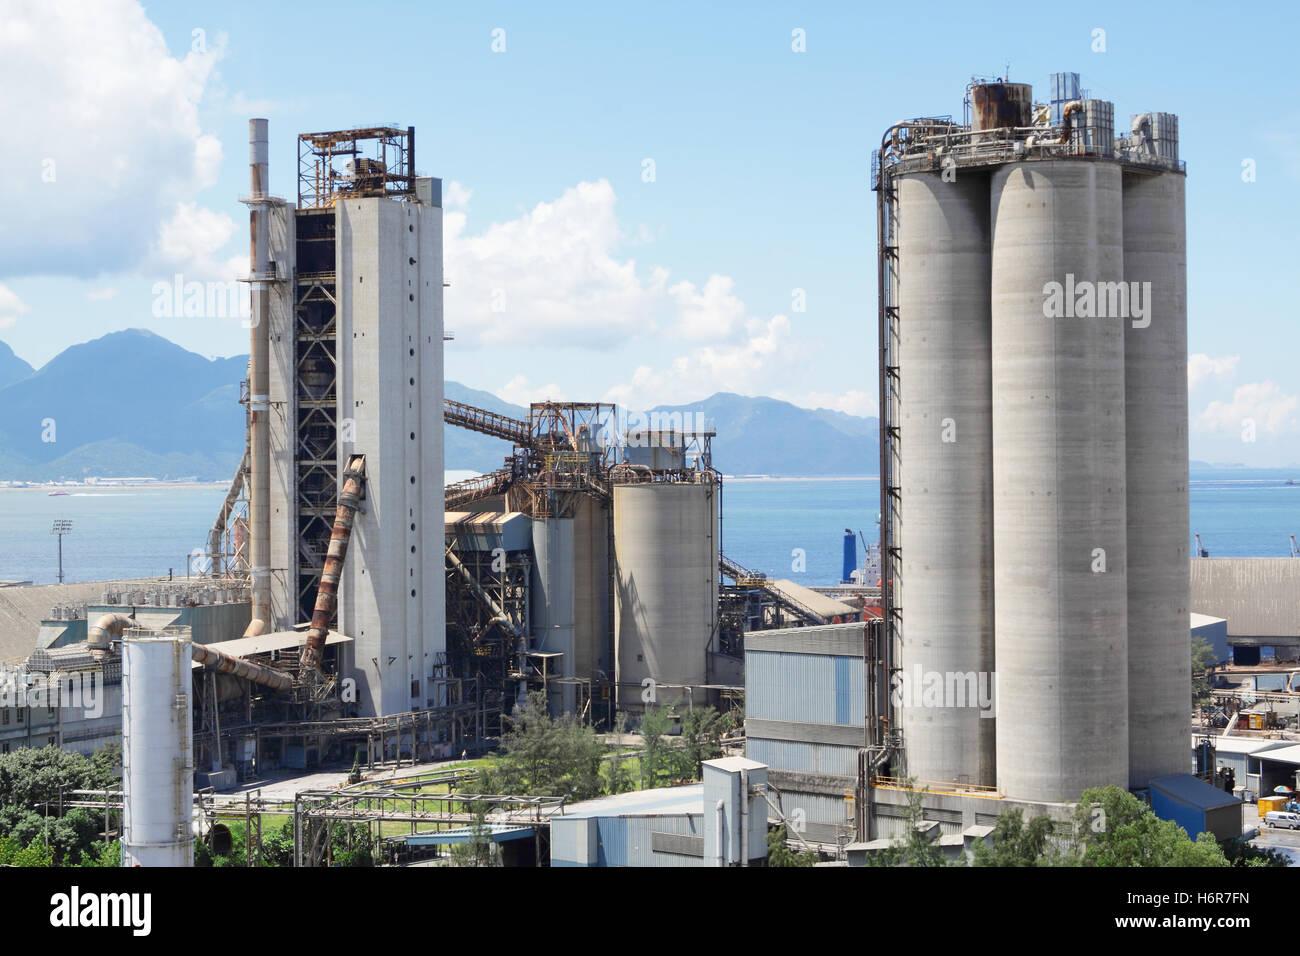 Cement Plant Machinery : Buildings industry concrete work factory cement plant